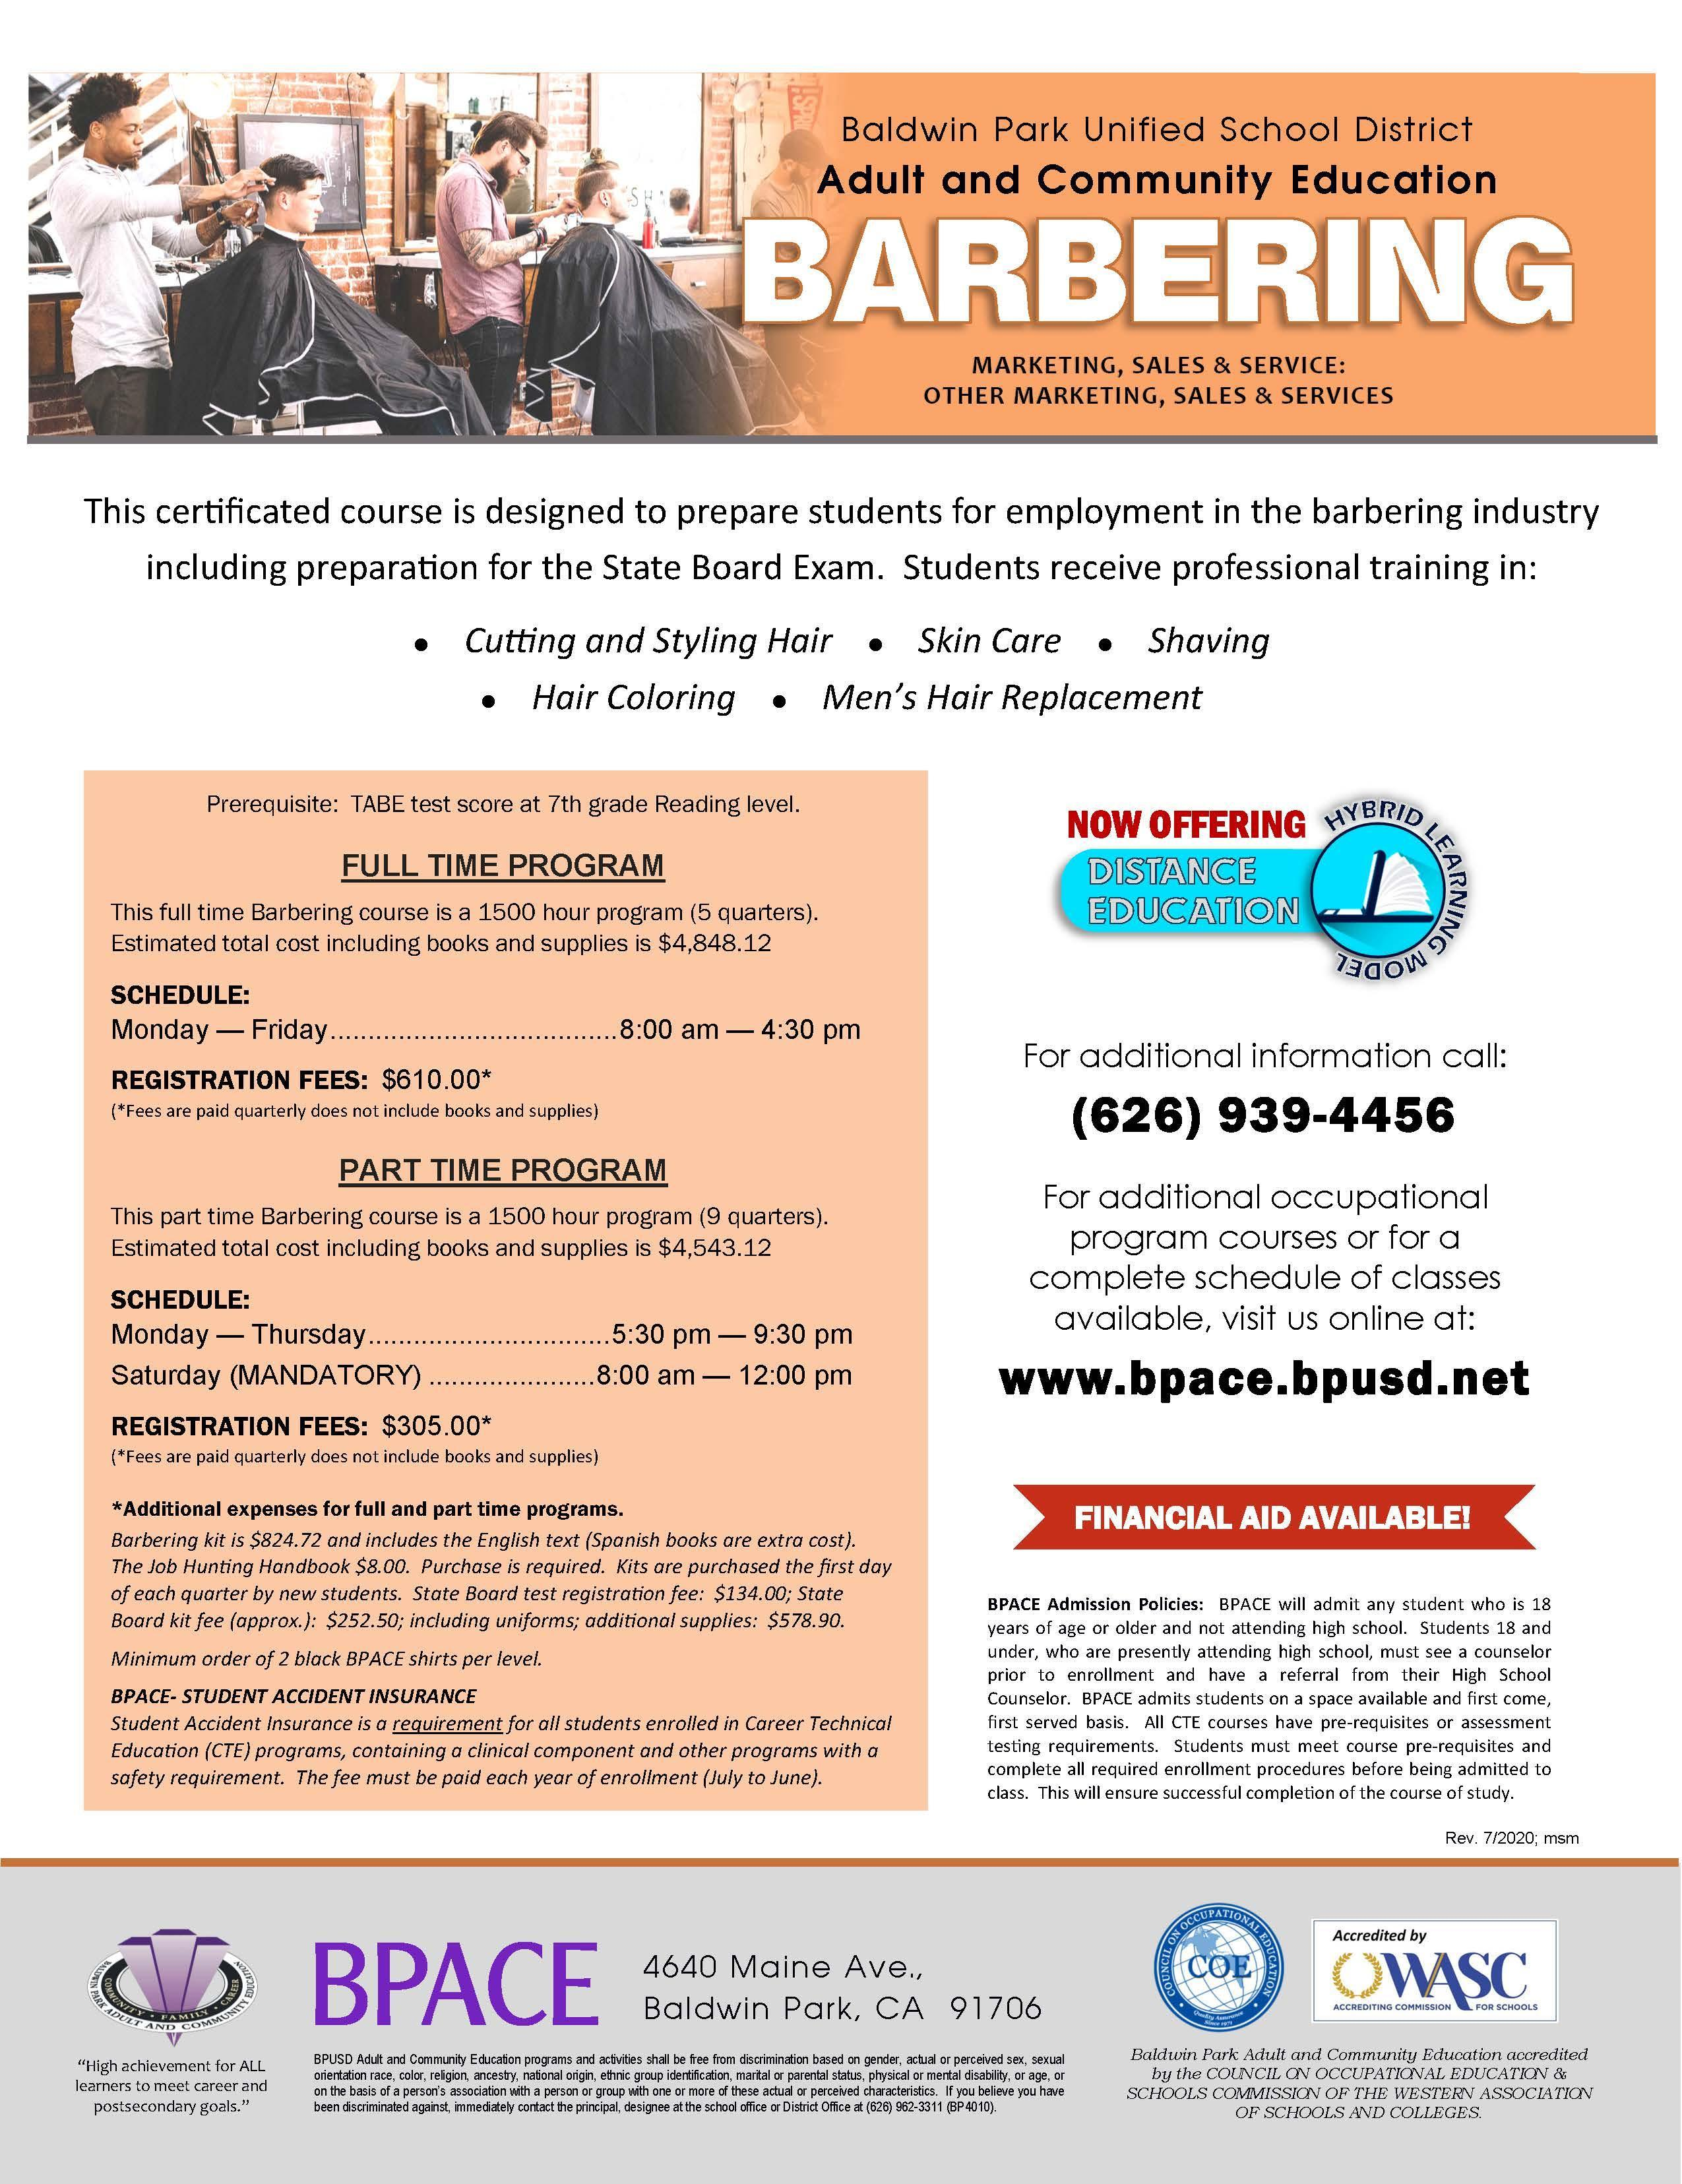 Barbering Class Flyer